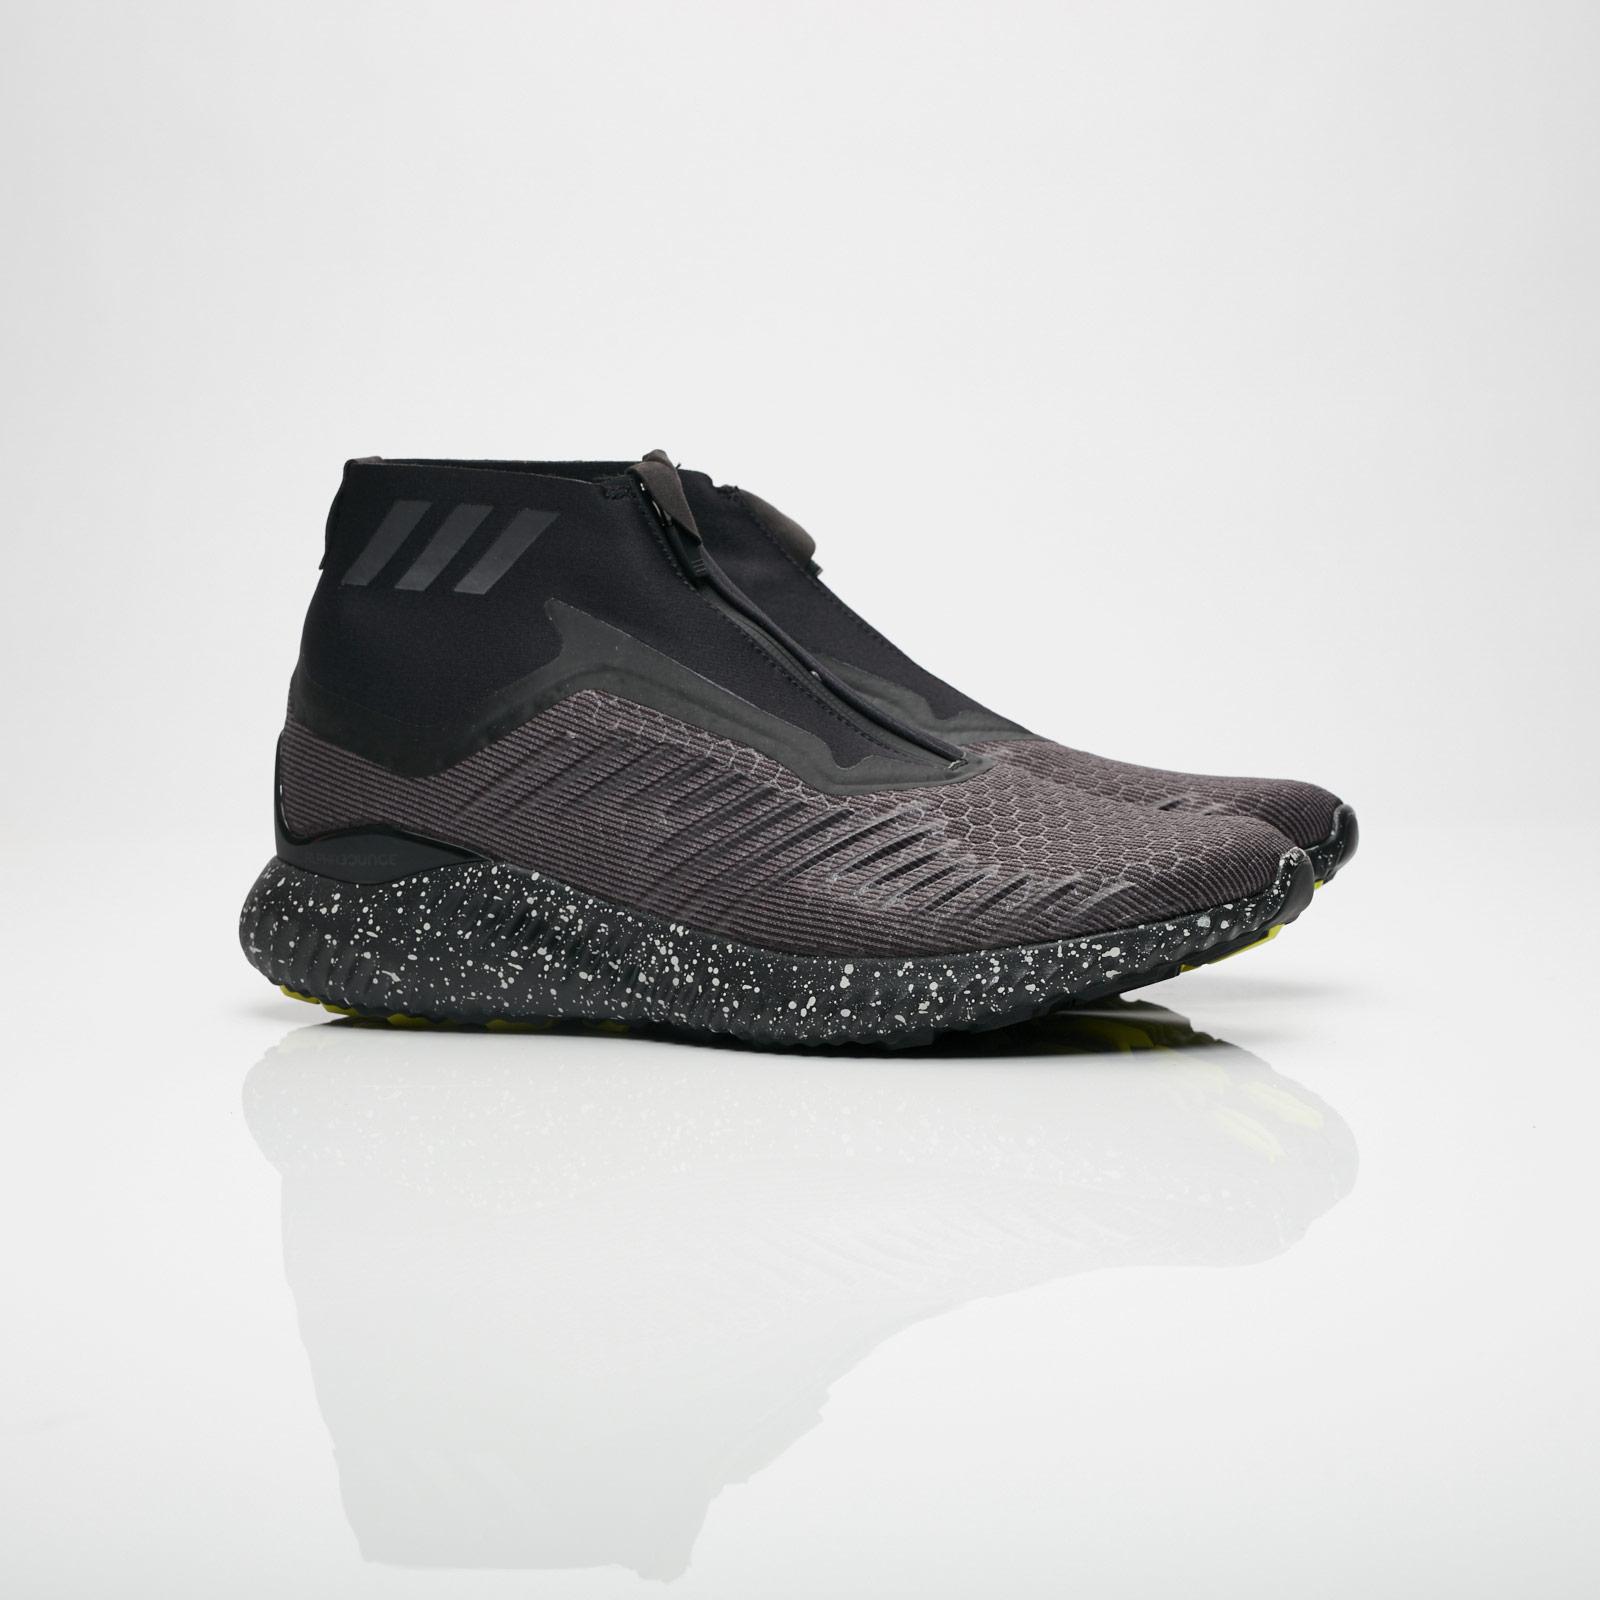 adidas Alphabounce Zip M - Bw1386